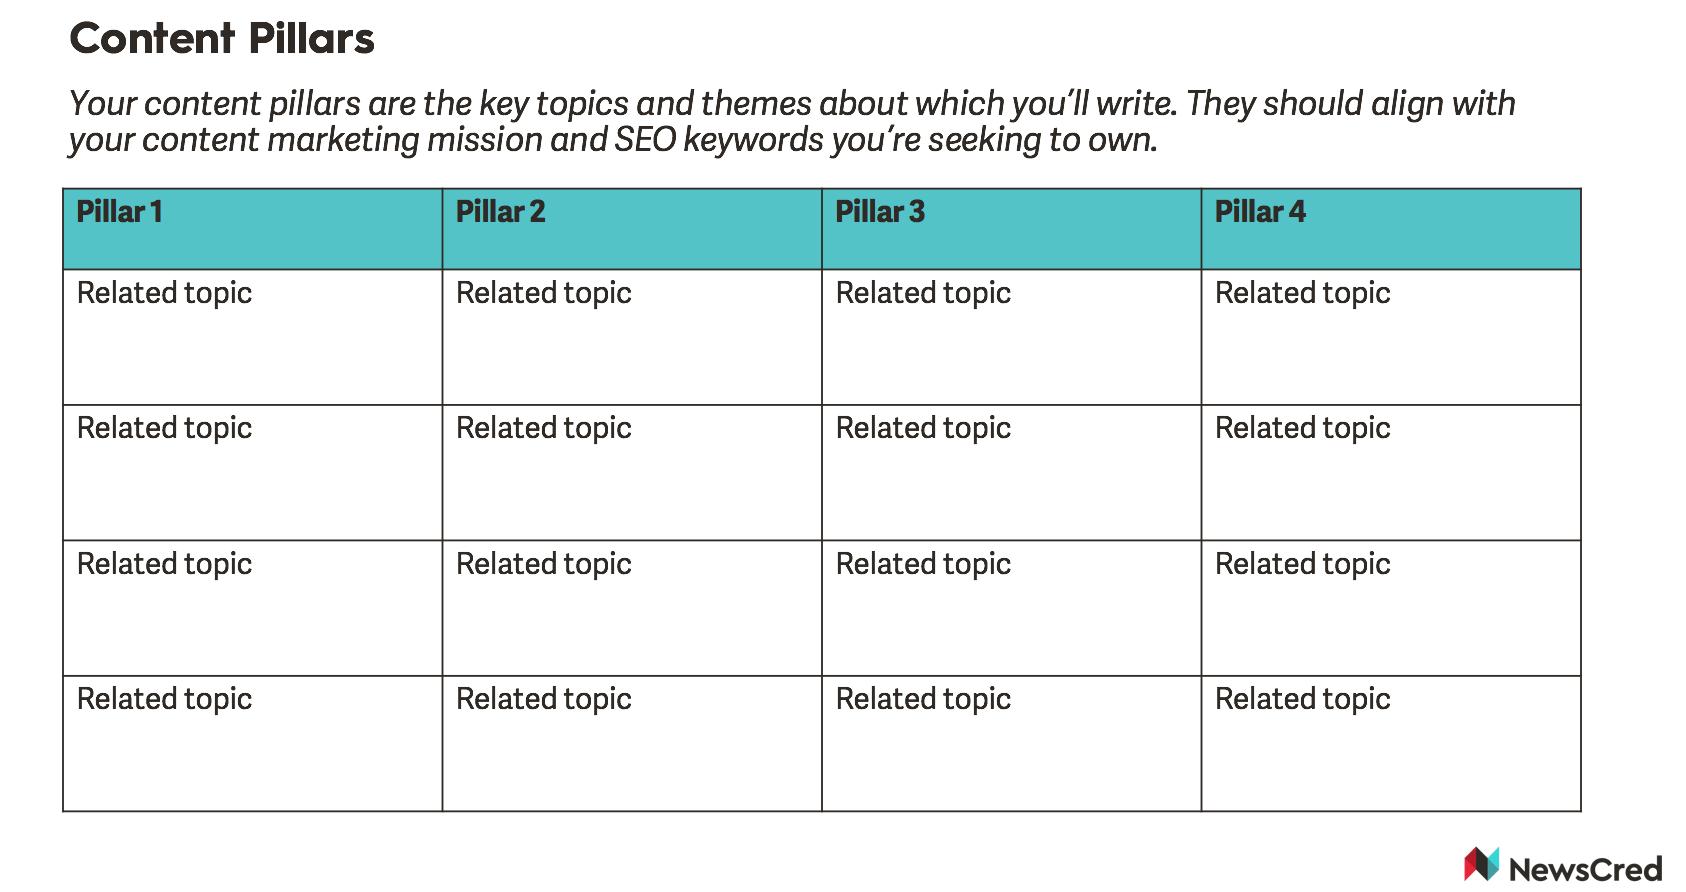 content pillars for editorial calendar.png